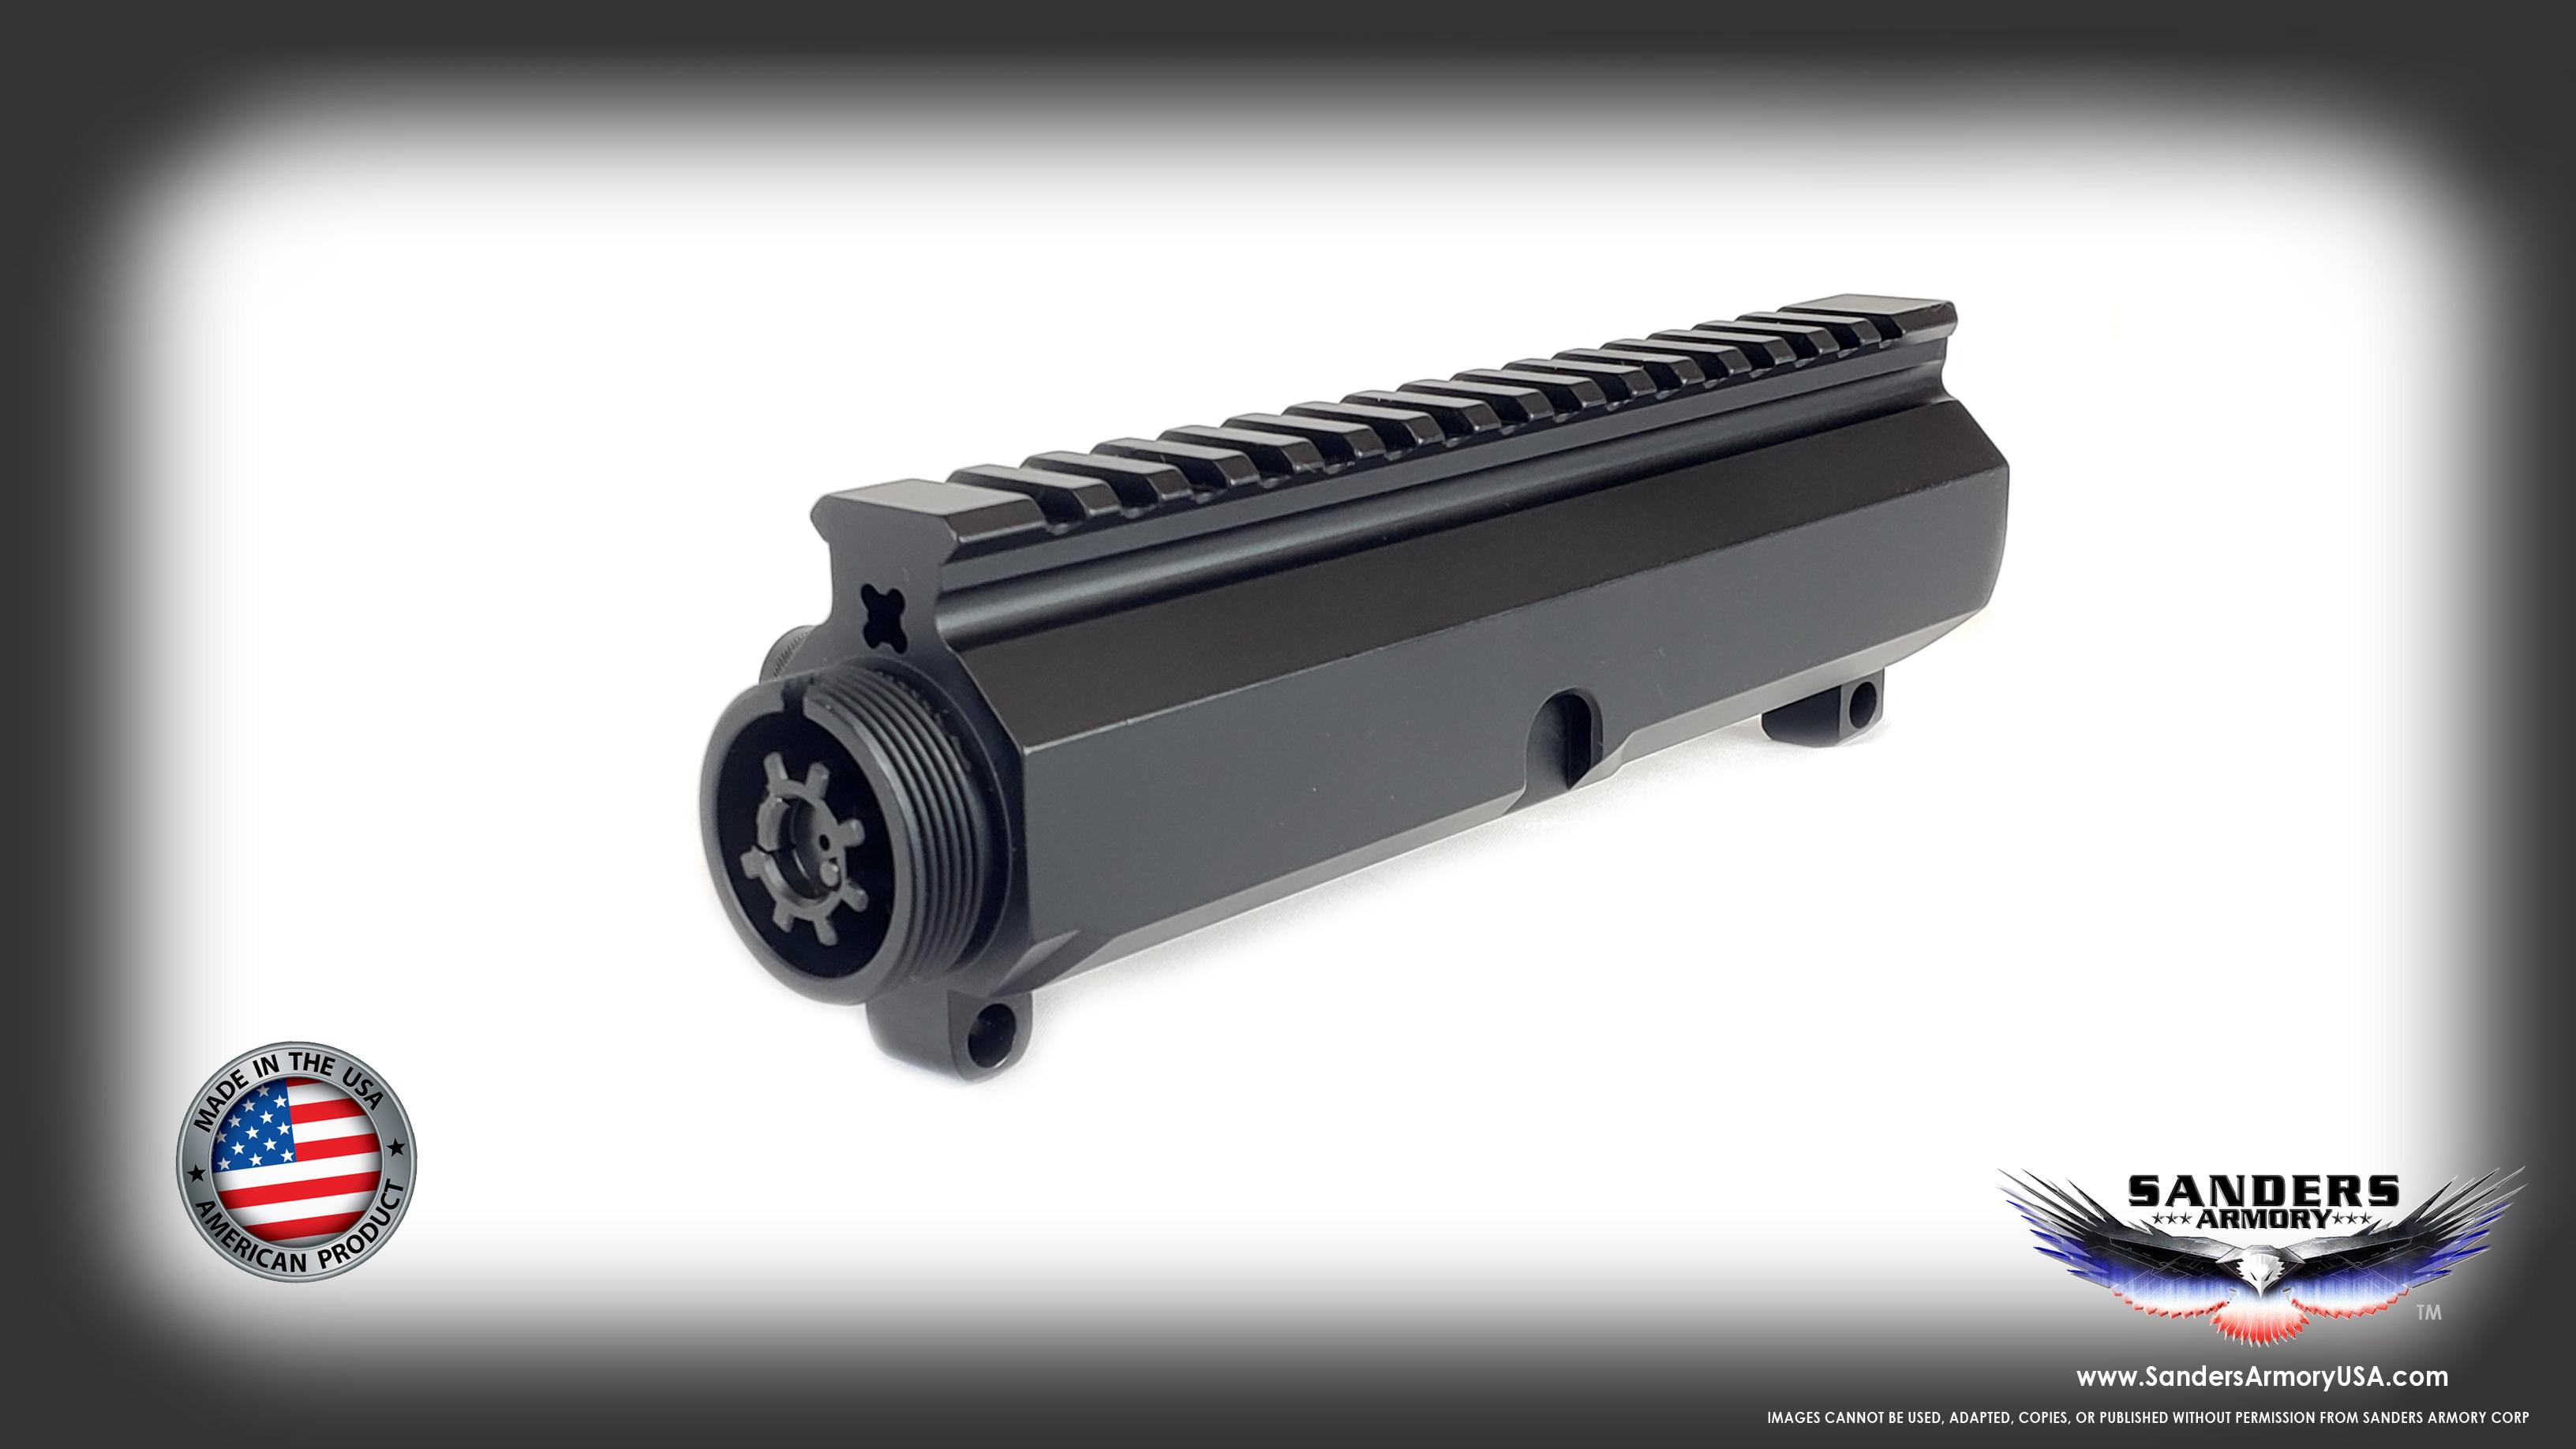 458 SOCOM BILLET Side Charge Upper Receiver with Nitride BCG